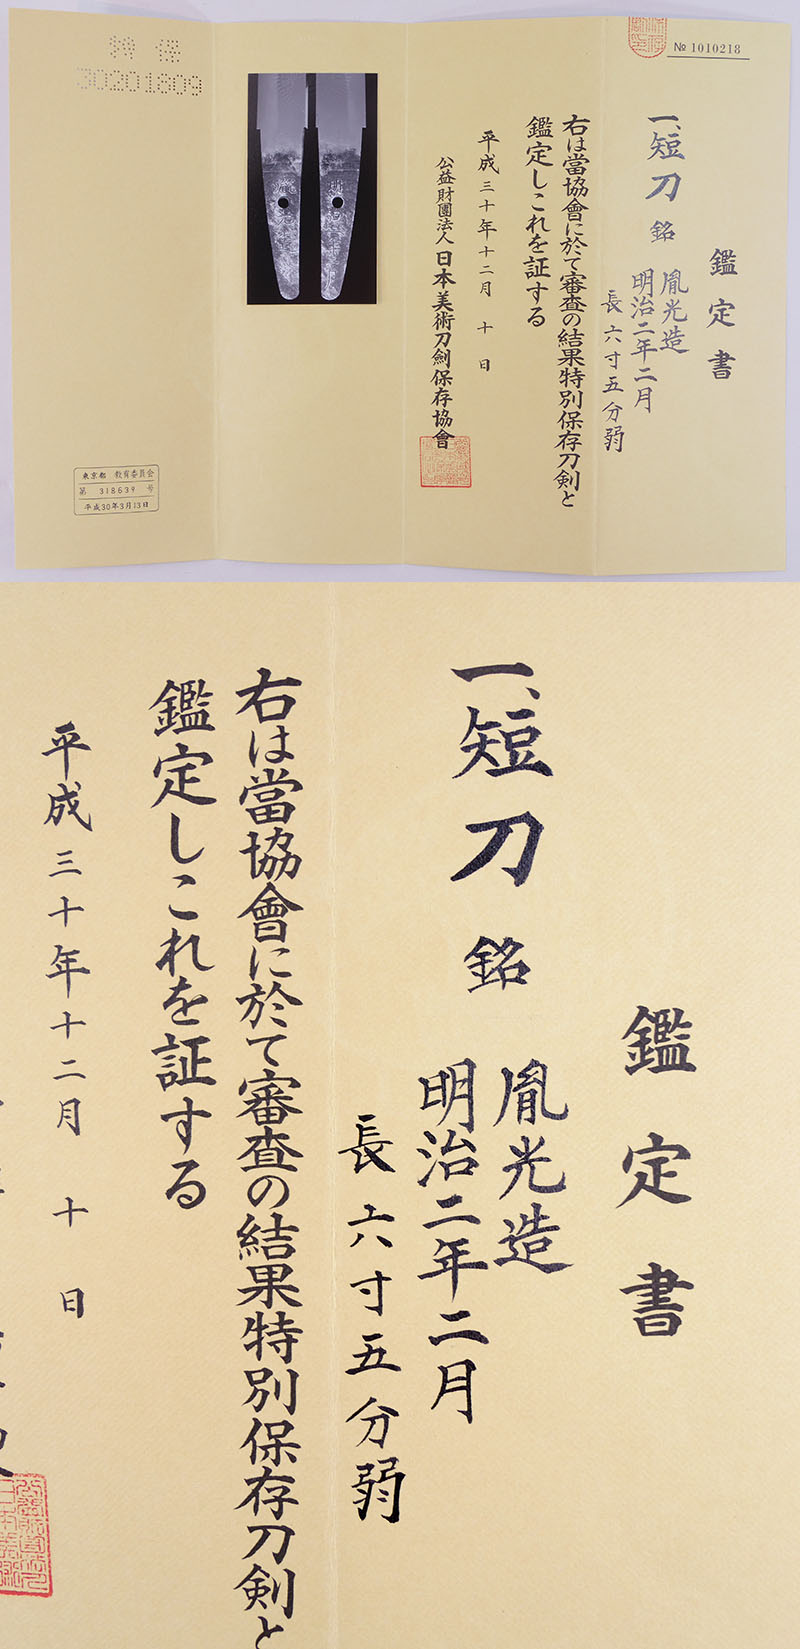 胤光造 (心慶胤光) Picture of Certificate